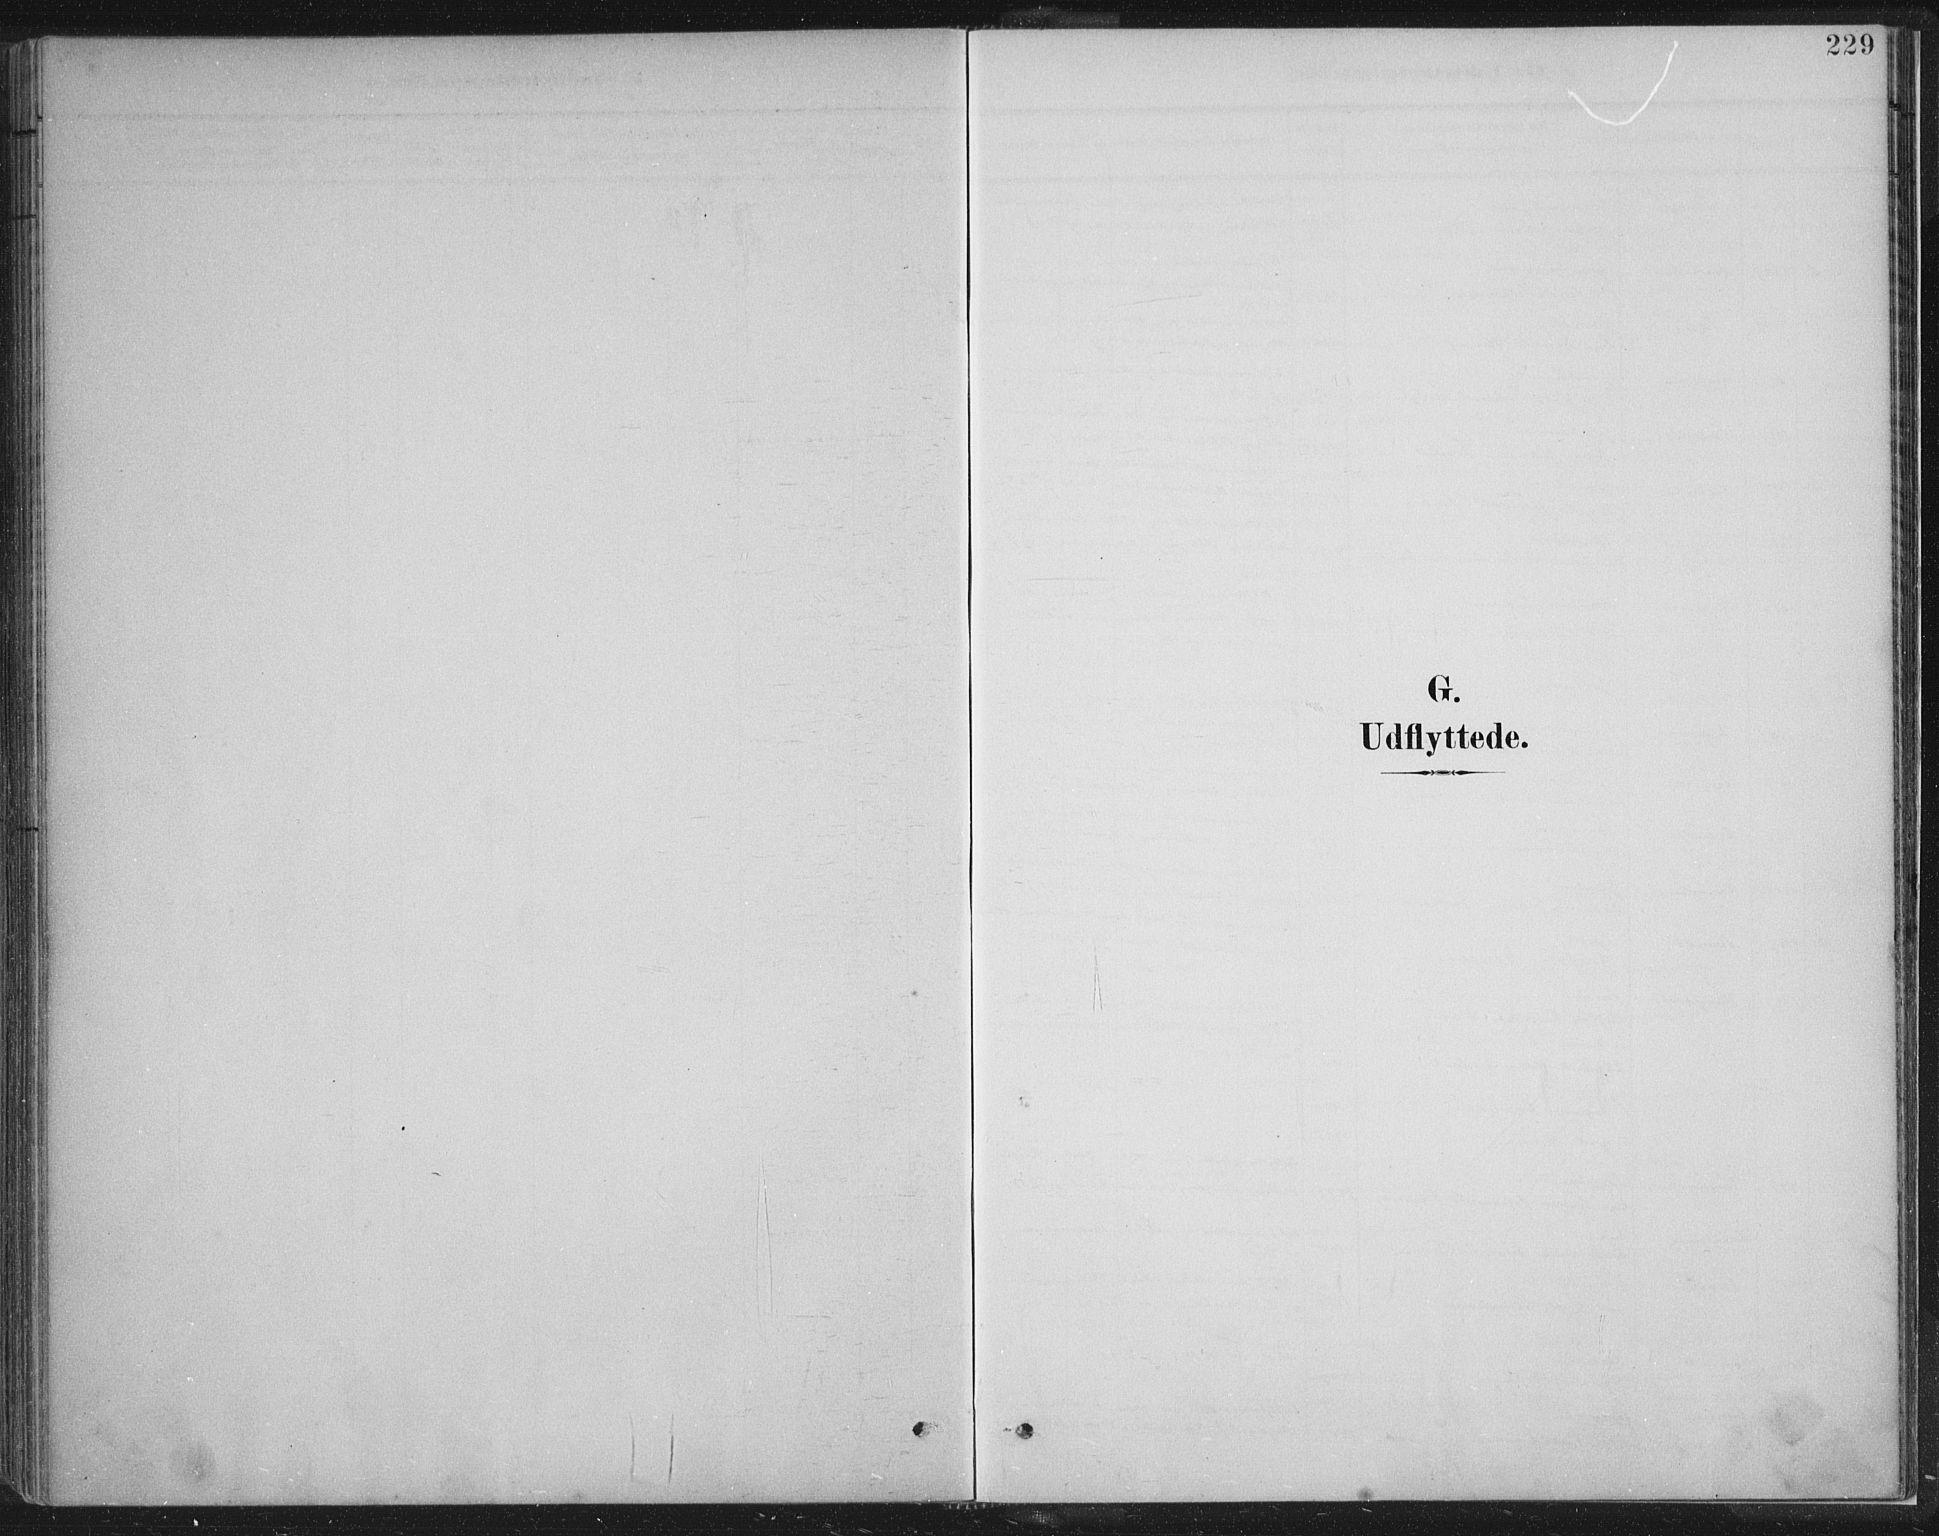 SAST, Tysvær sokneprestkontor, H/Ha/Haa/L0008: Ministerialbok nr. A 8, 1897-1918, s. 229